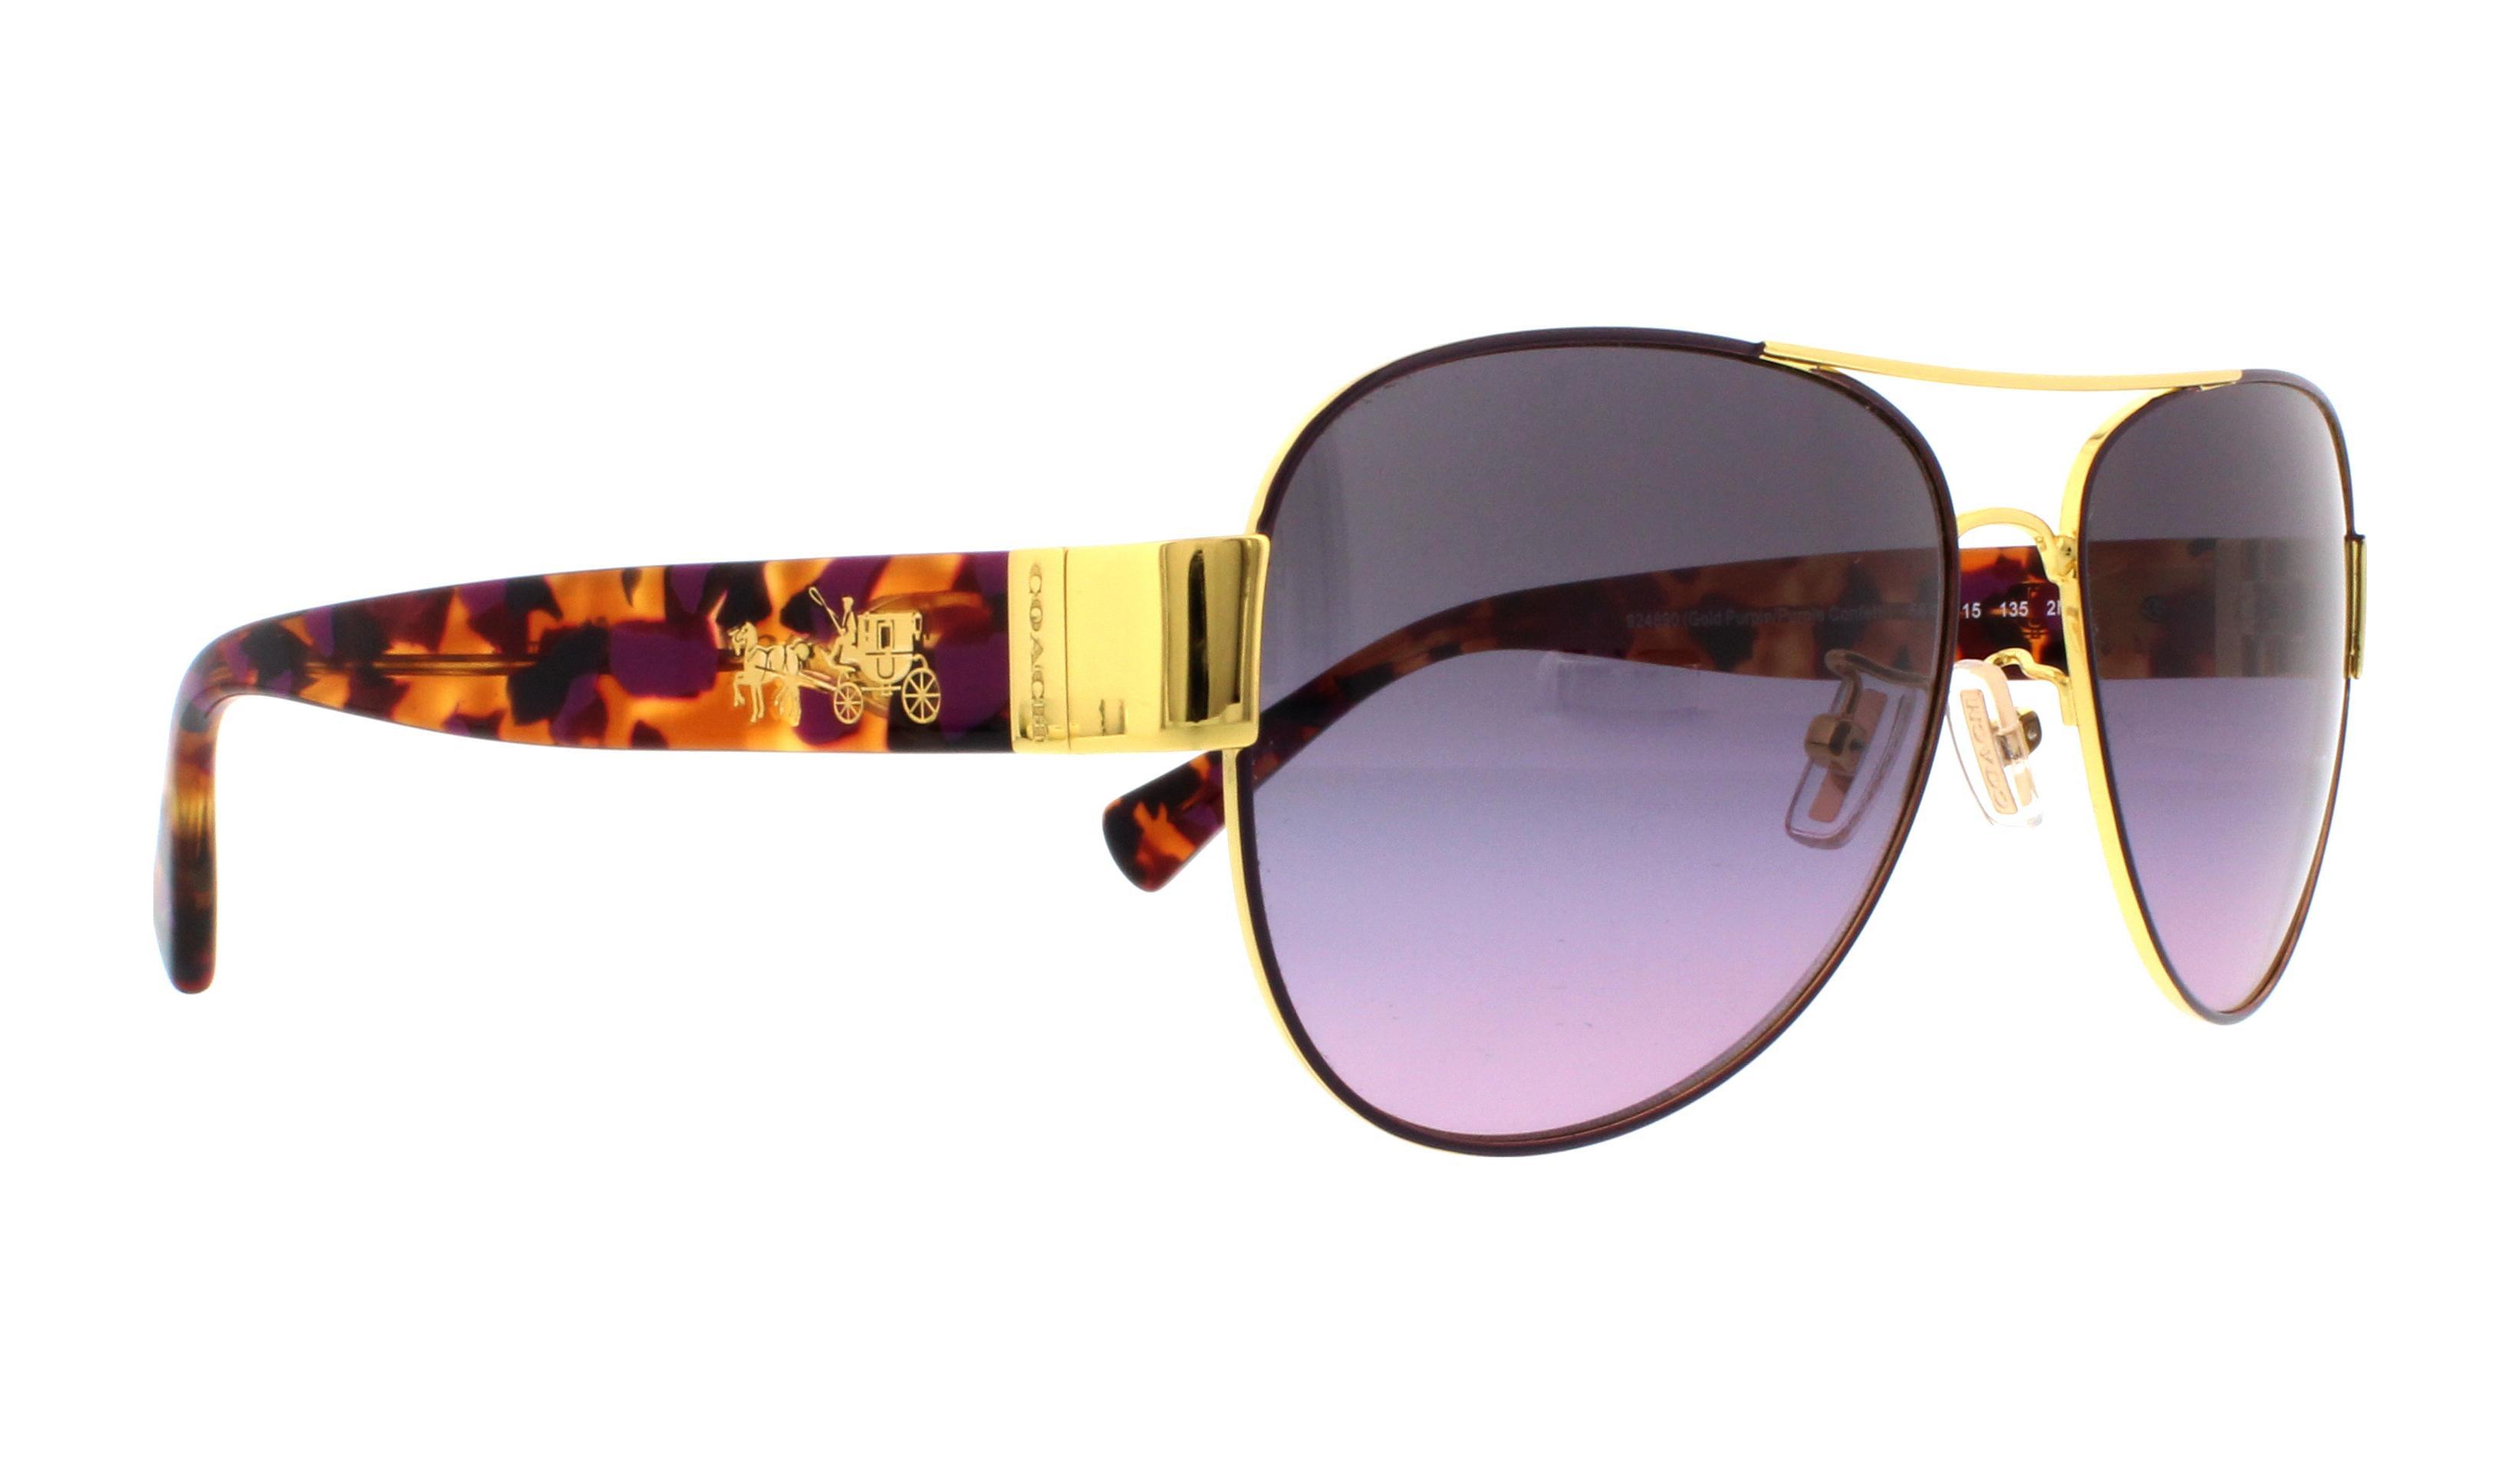 d1111e4bd7 ... clearance coach sunglasses hc7059 l138 924890 gold purple purple  confetti 58mm 597f5 8fae1